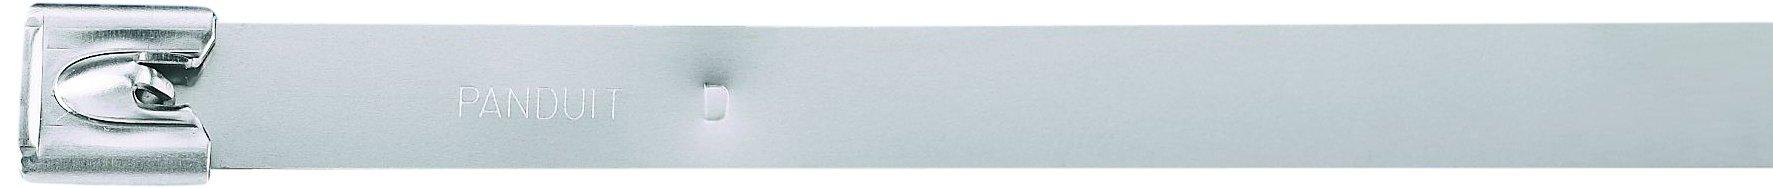 Panduit MLT6EH-LP Pan-Steel Self-Locking Cable Tie, General Purpose, Extra-Heavy Cross Section, AISI 304 Stainless Steel, 6.0'' Max Bundle Diameter, 1.00'' Min Bundle Diameter, 600lbs Min Tensile Strength, 0.010'' Thickness, 0.50'' Width, 23.4'' Length (Pack o by Panduit (Image #1)